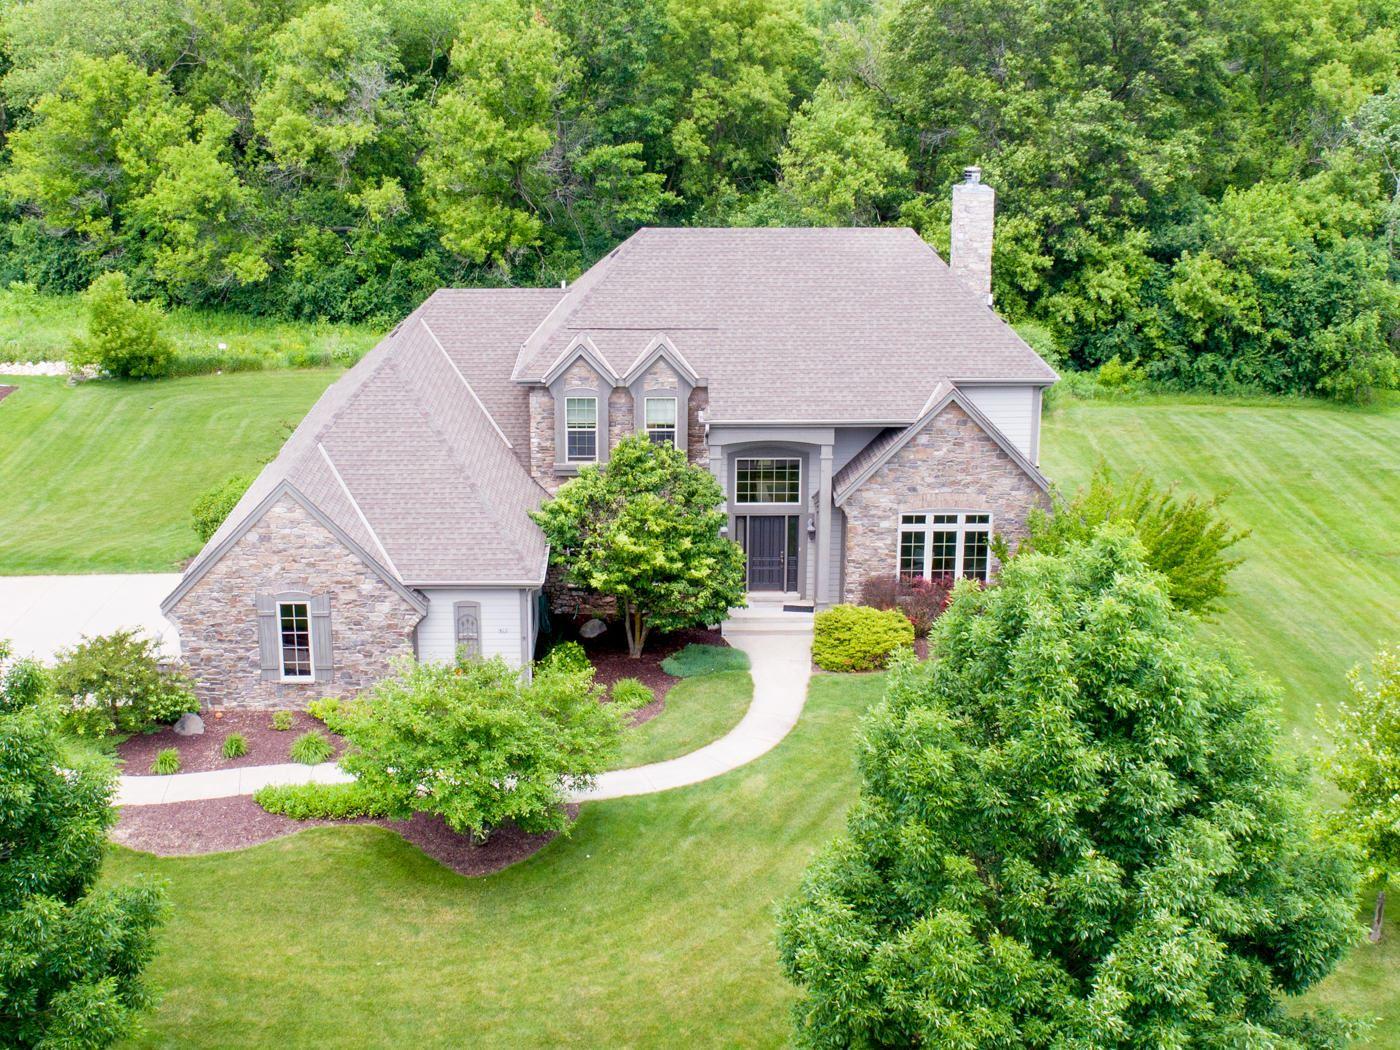 422 River Grove Ln, Hartland, WI 53029 - #: 1645513